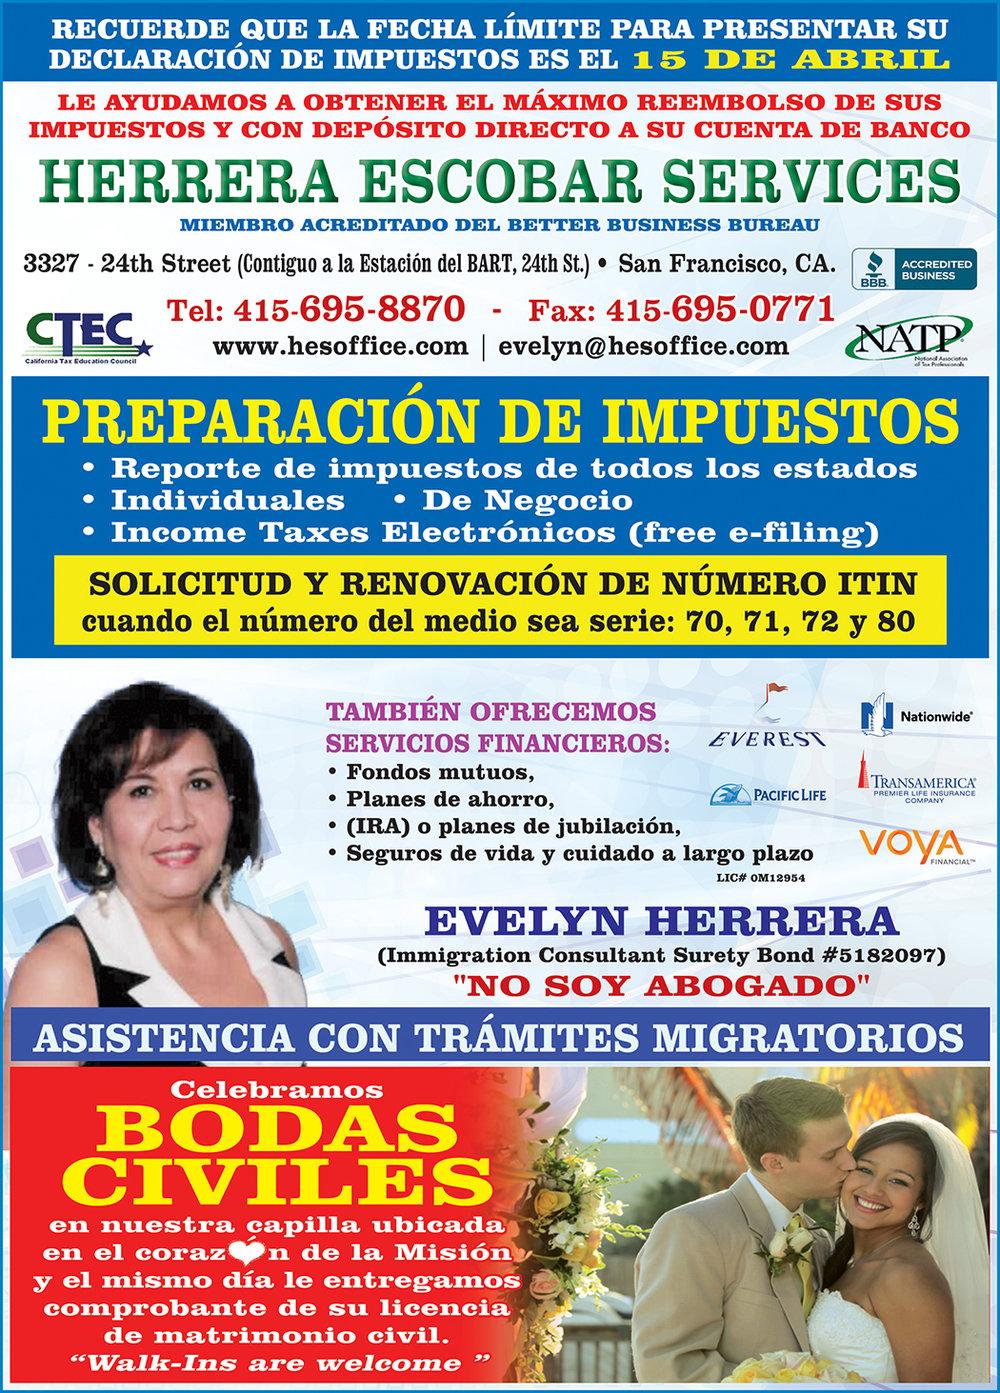 Herrera Escobar 1 Pag - ABRIL 2018.jpg